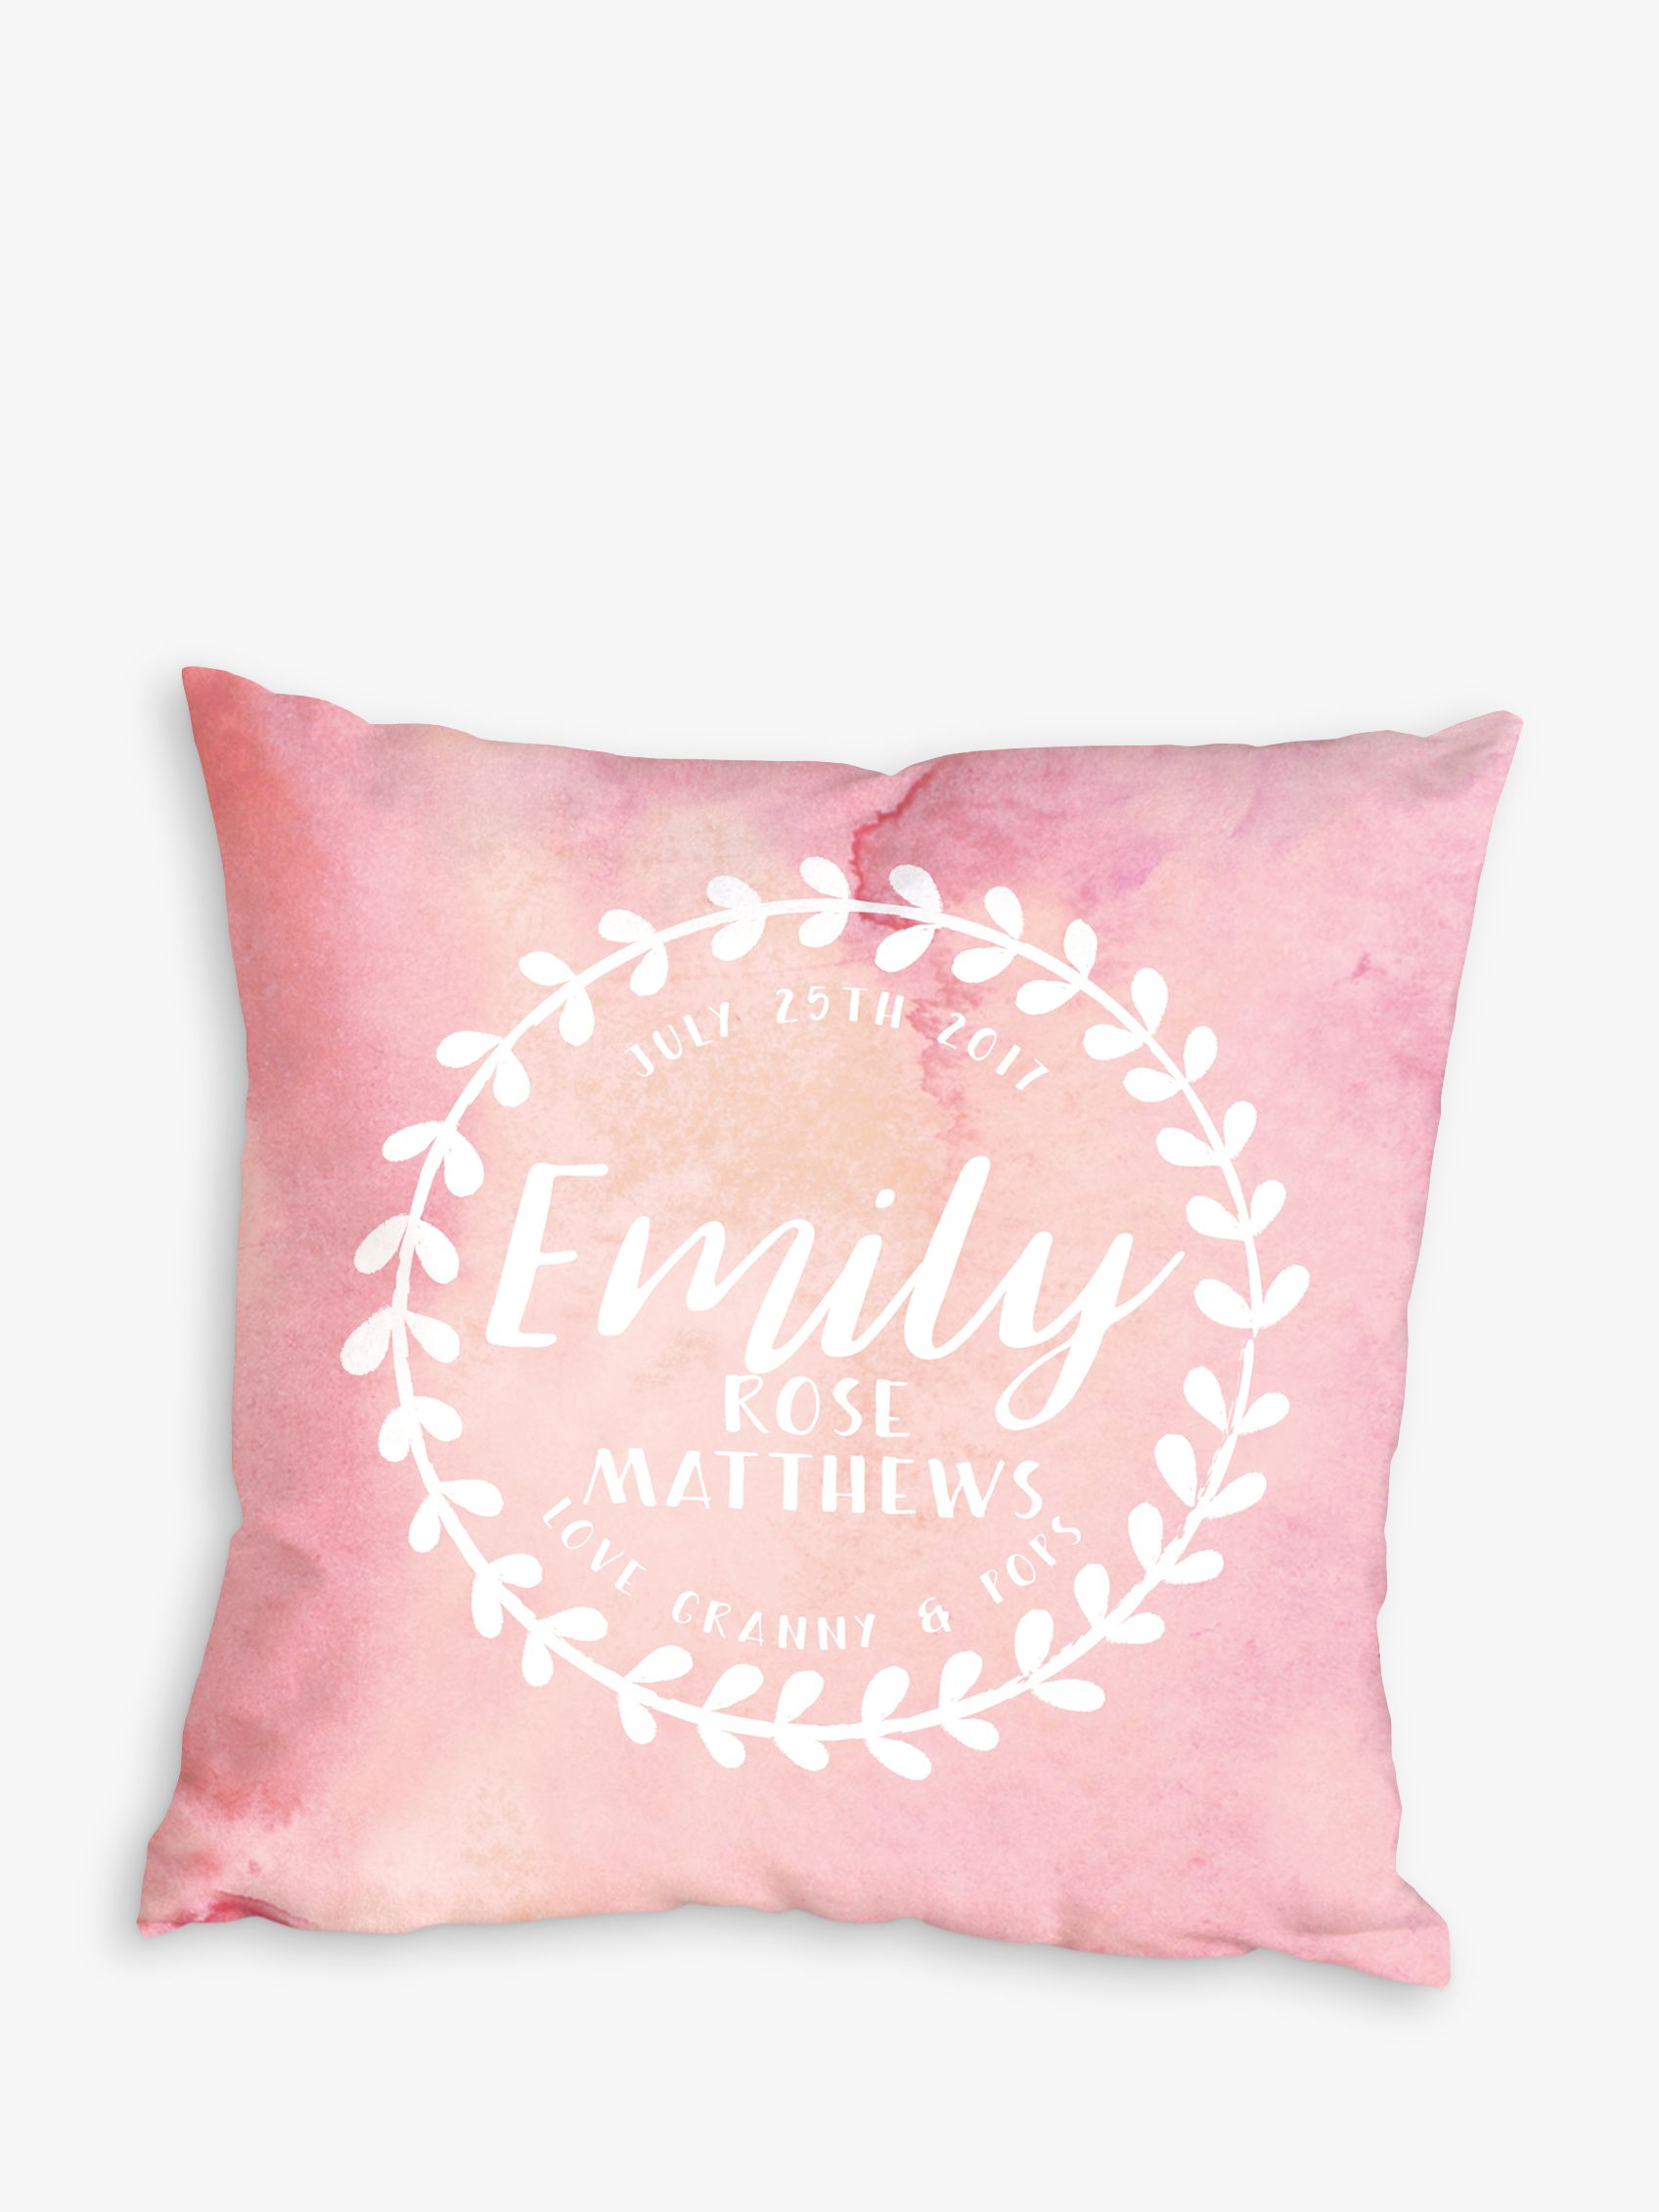 Letterfest Letterfest Personalised Baby Wreath Cushion